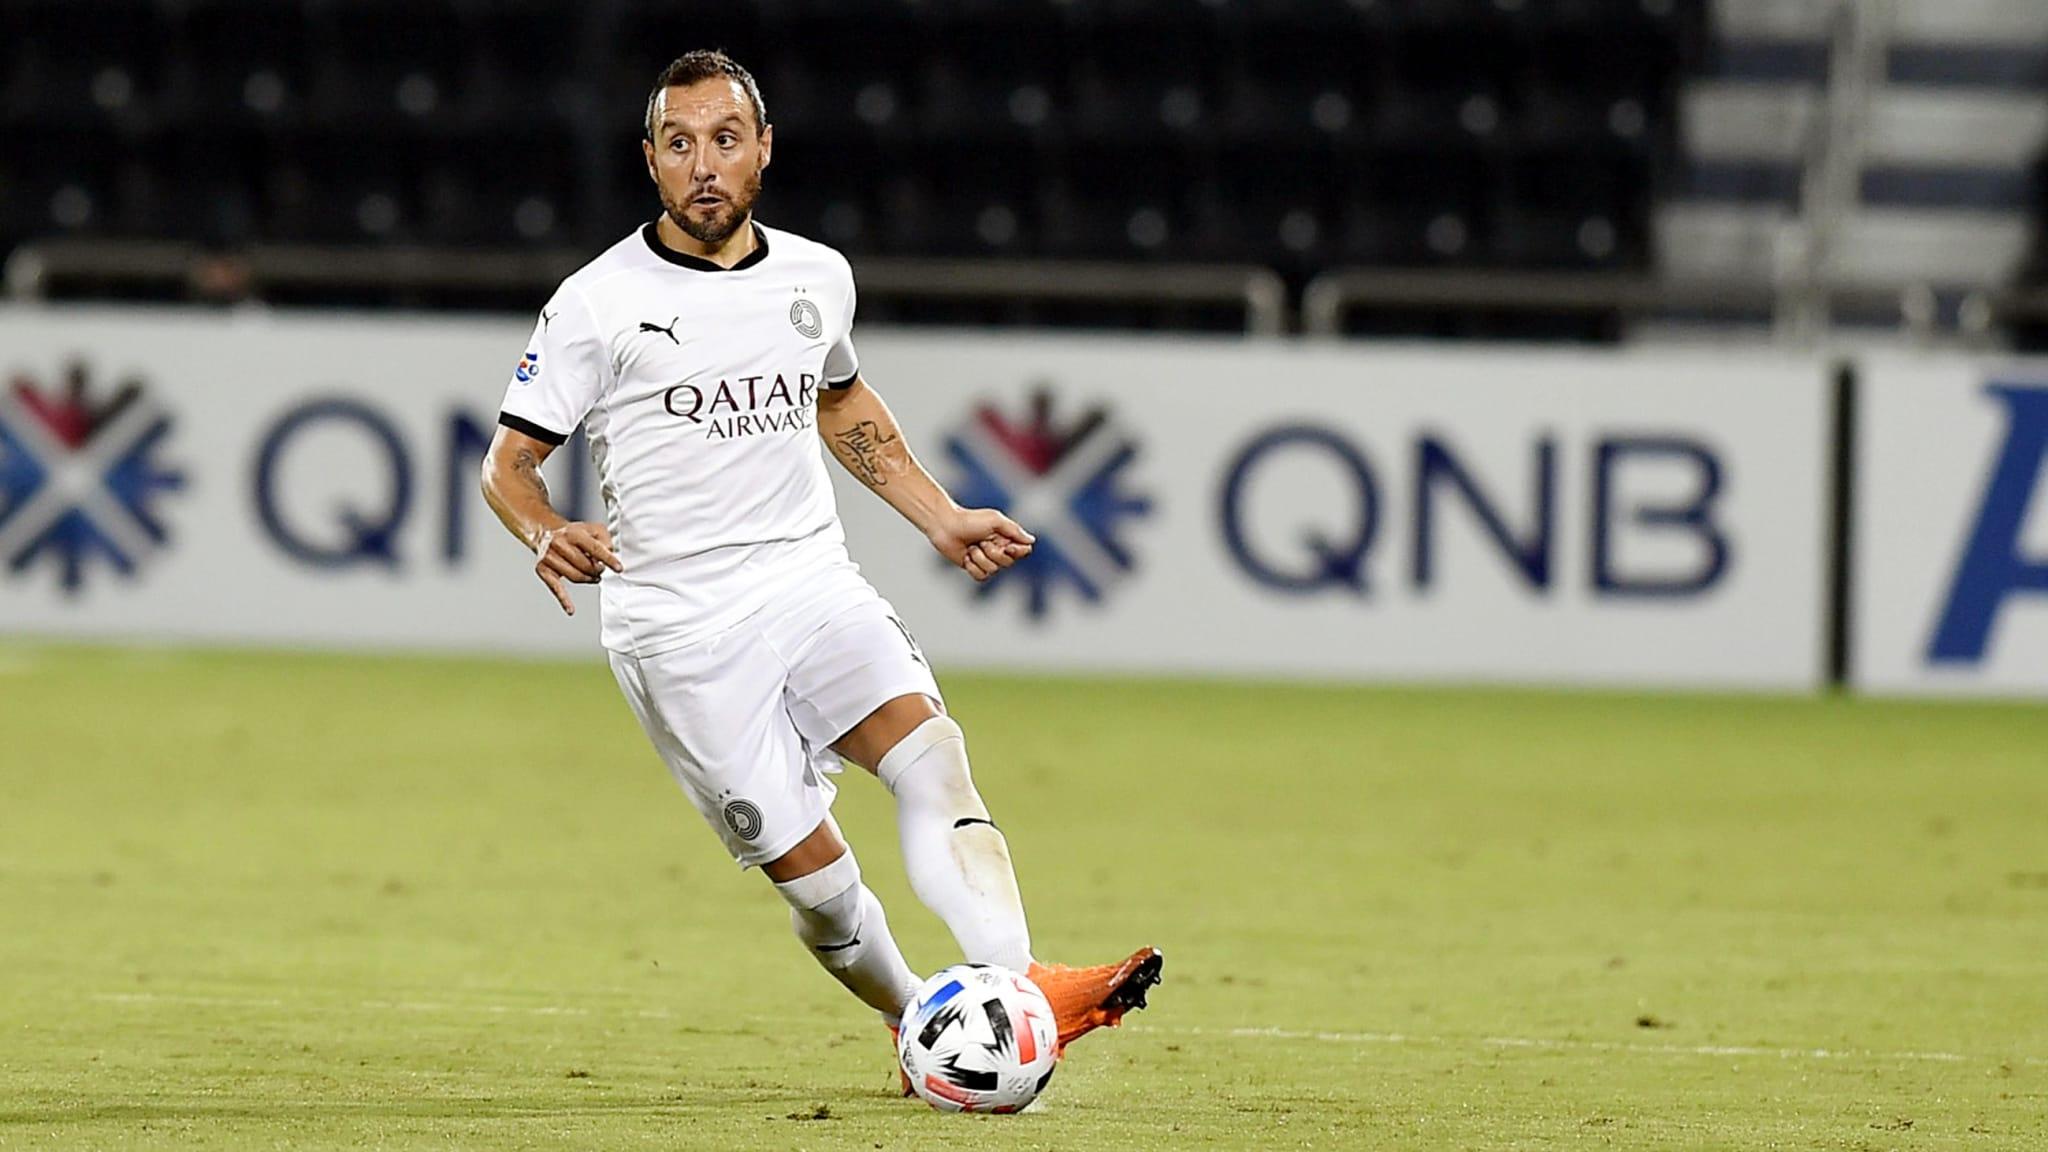 Al Sadd team player, Santi Cazorla